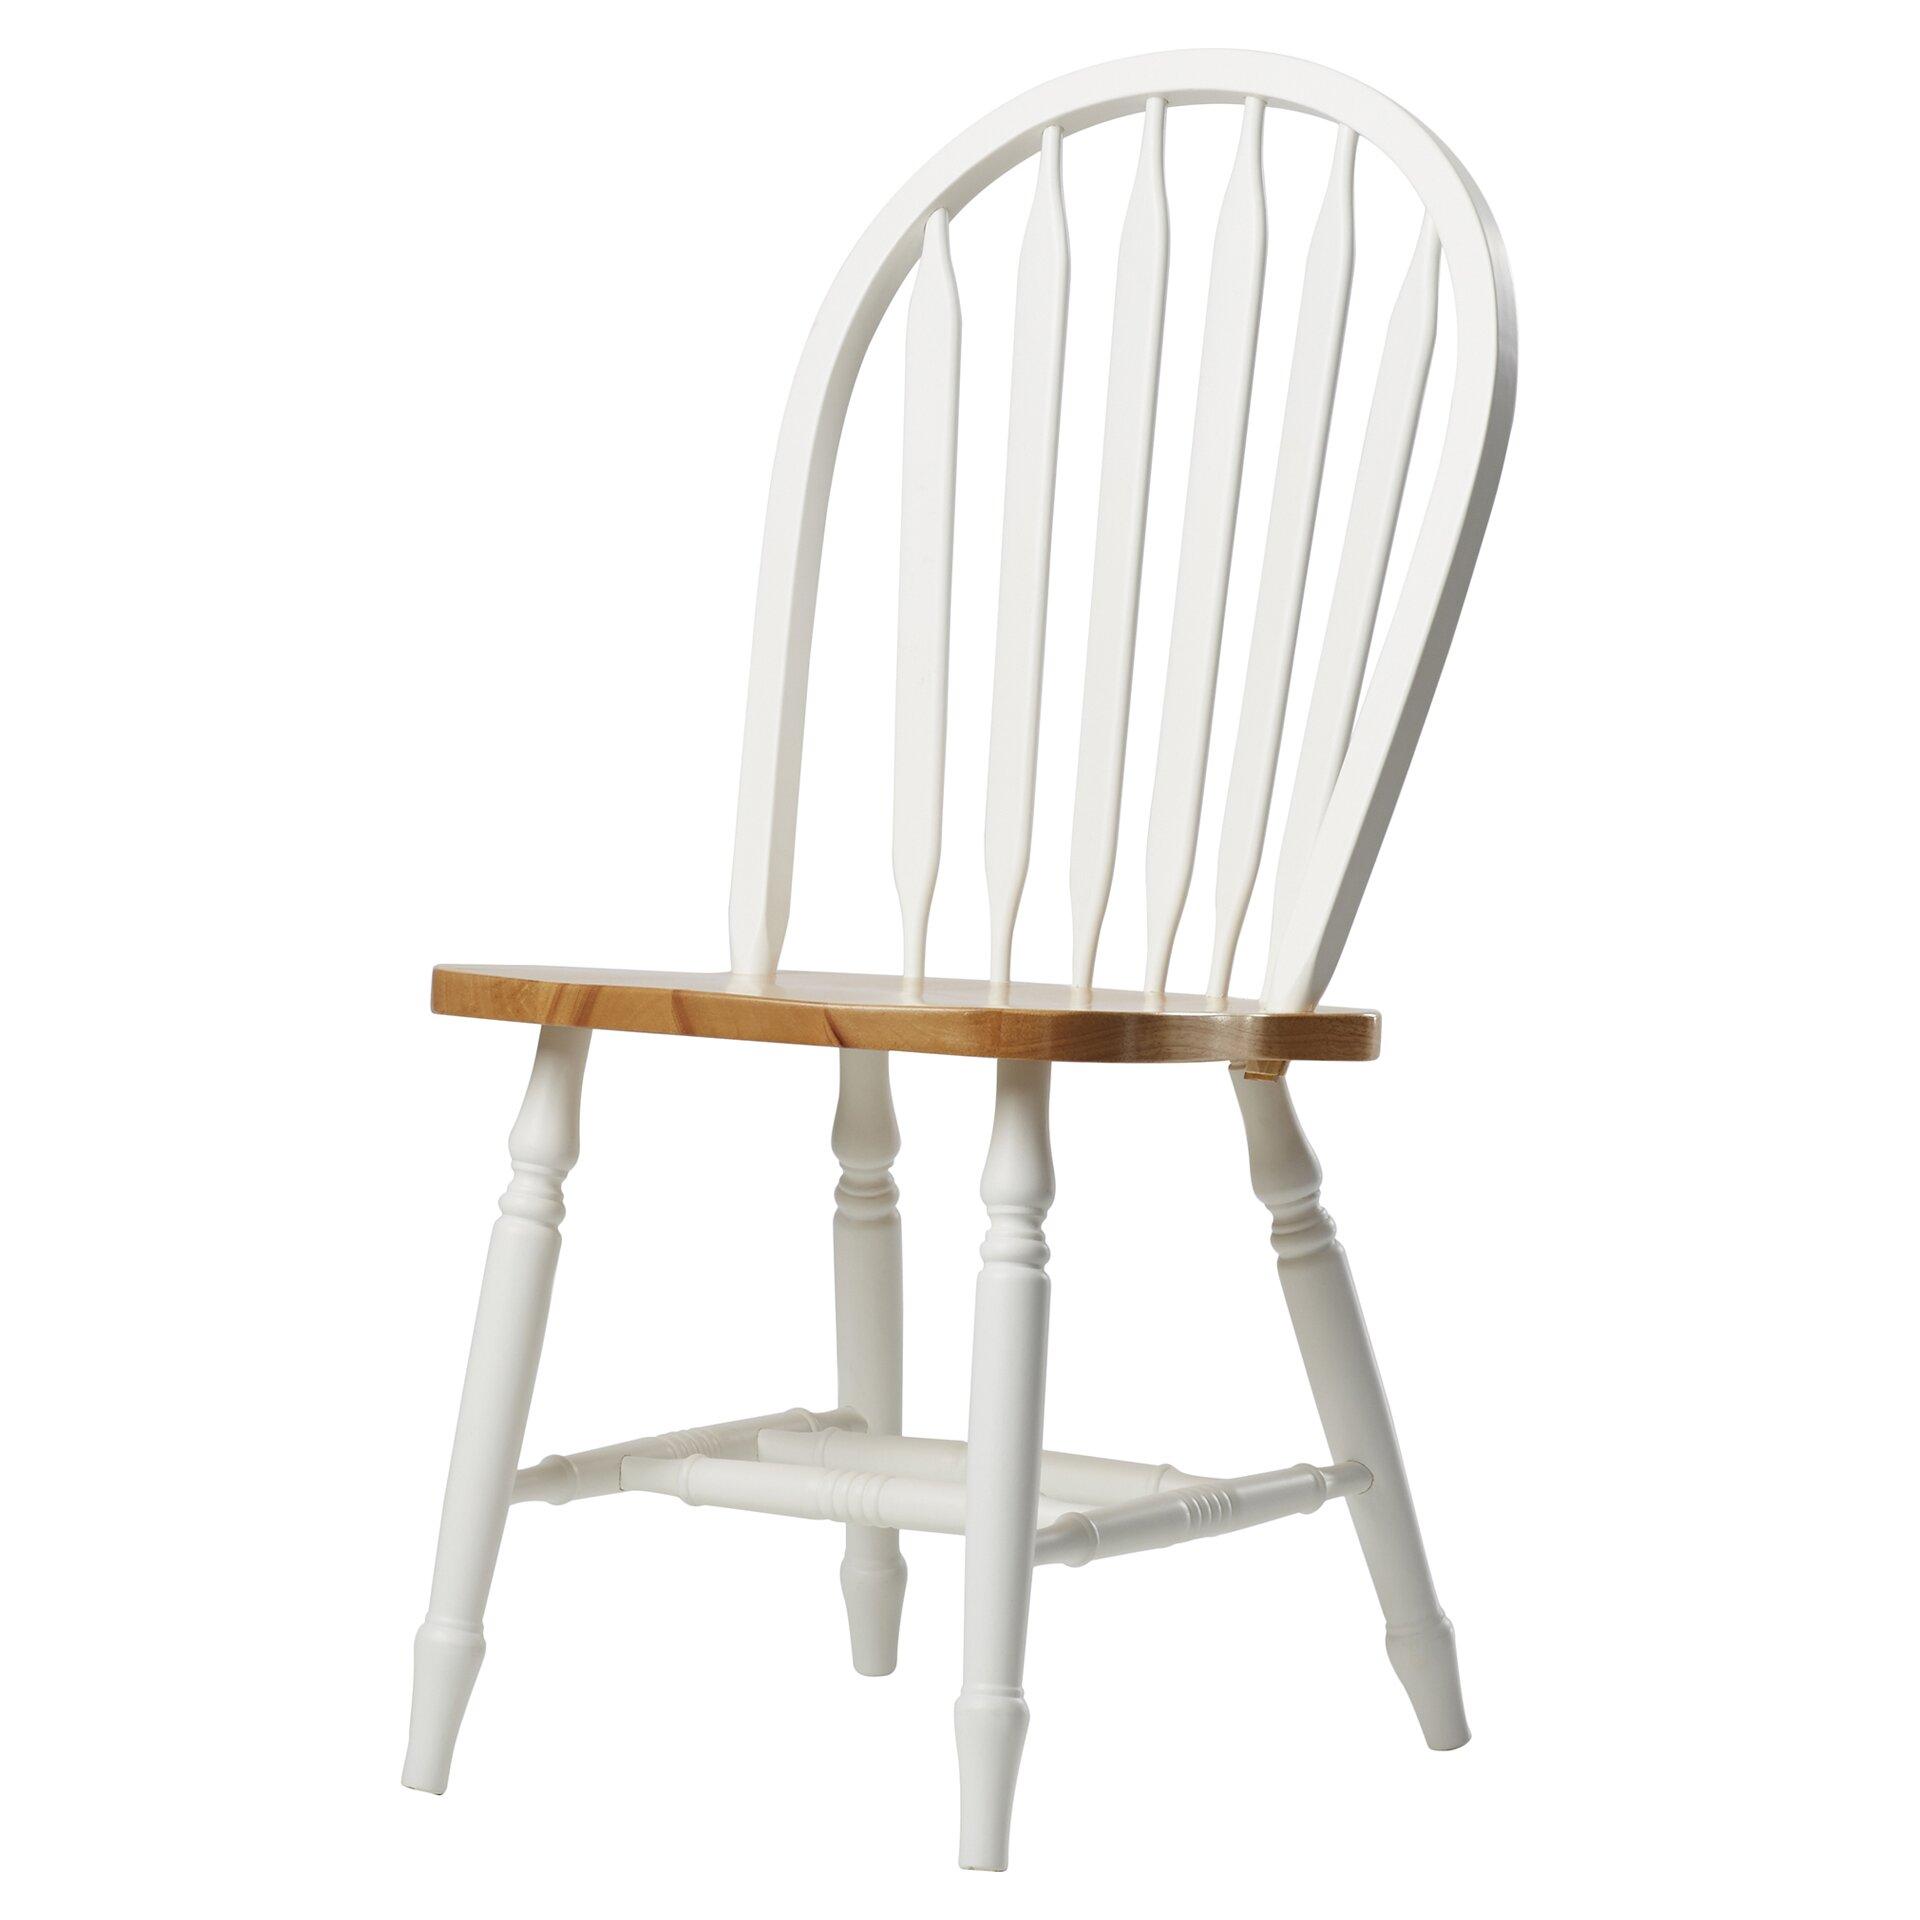 Audette Windsor Arrowback Solid Wood Dining Chair